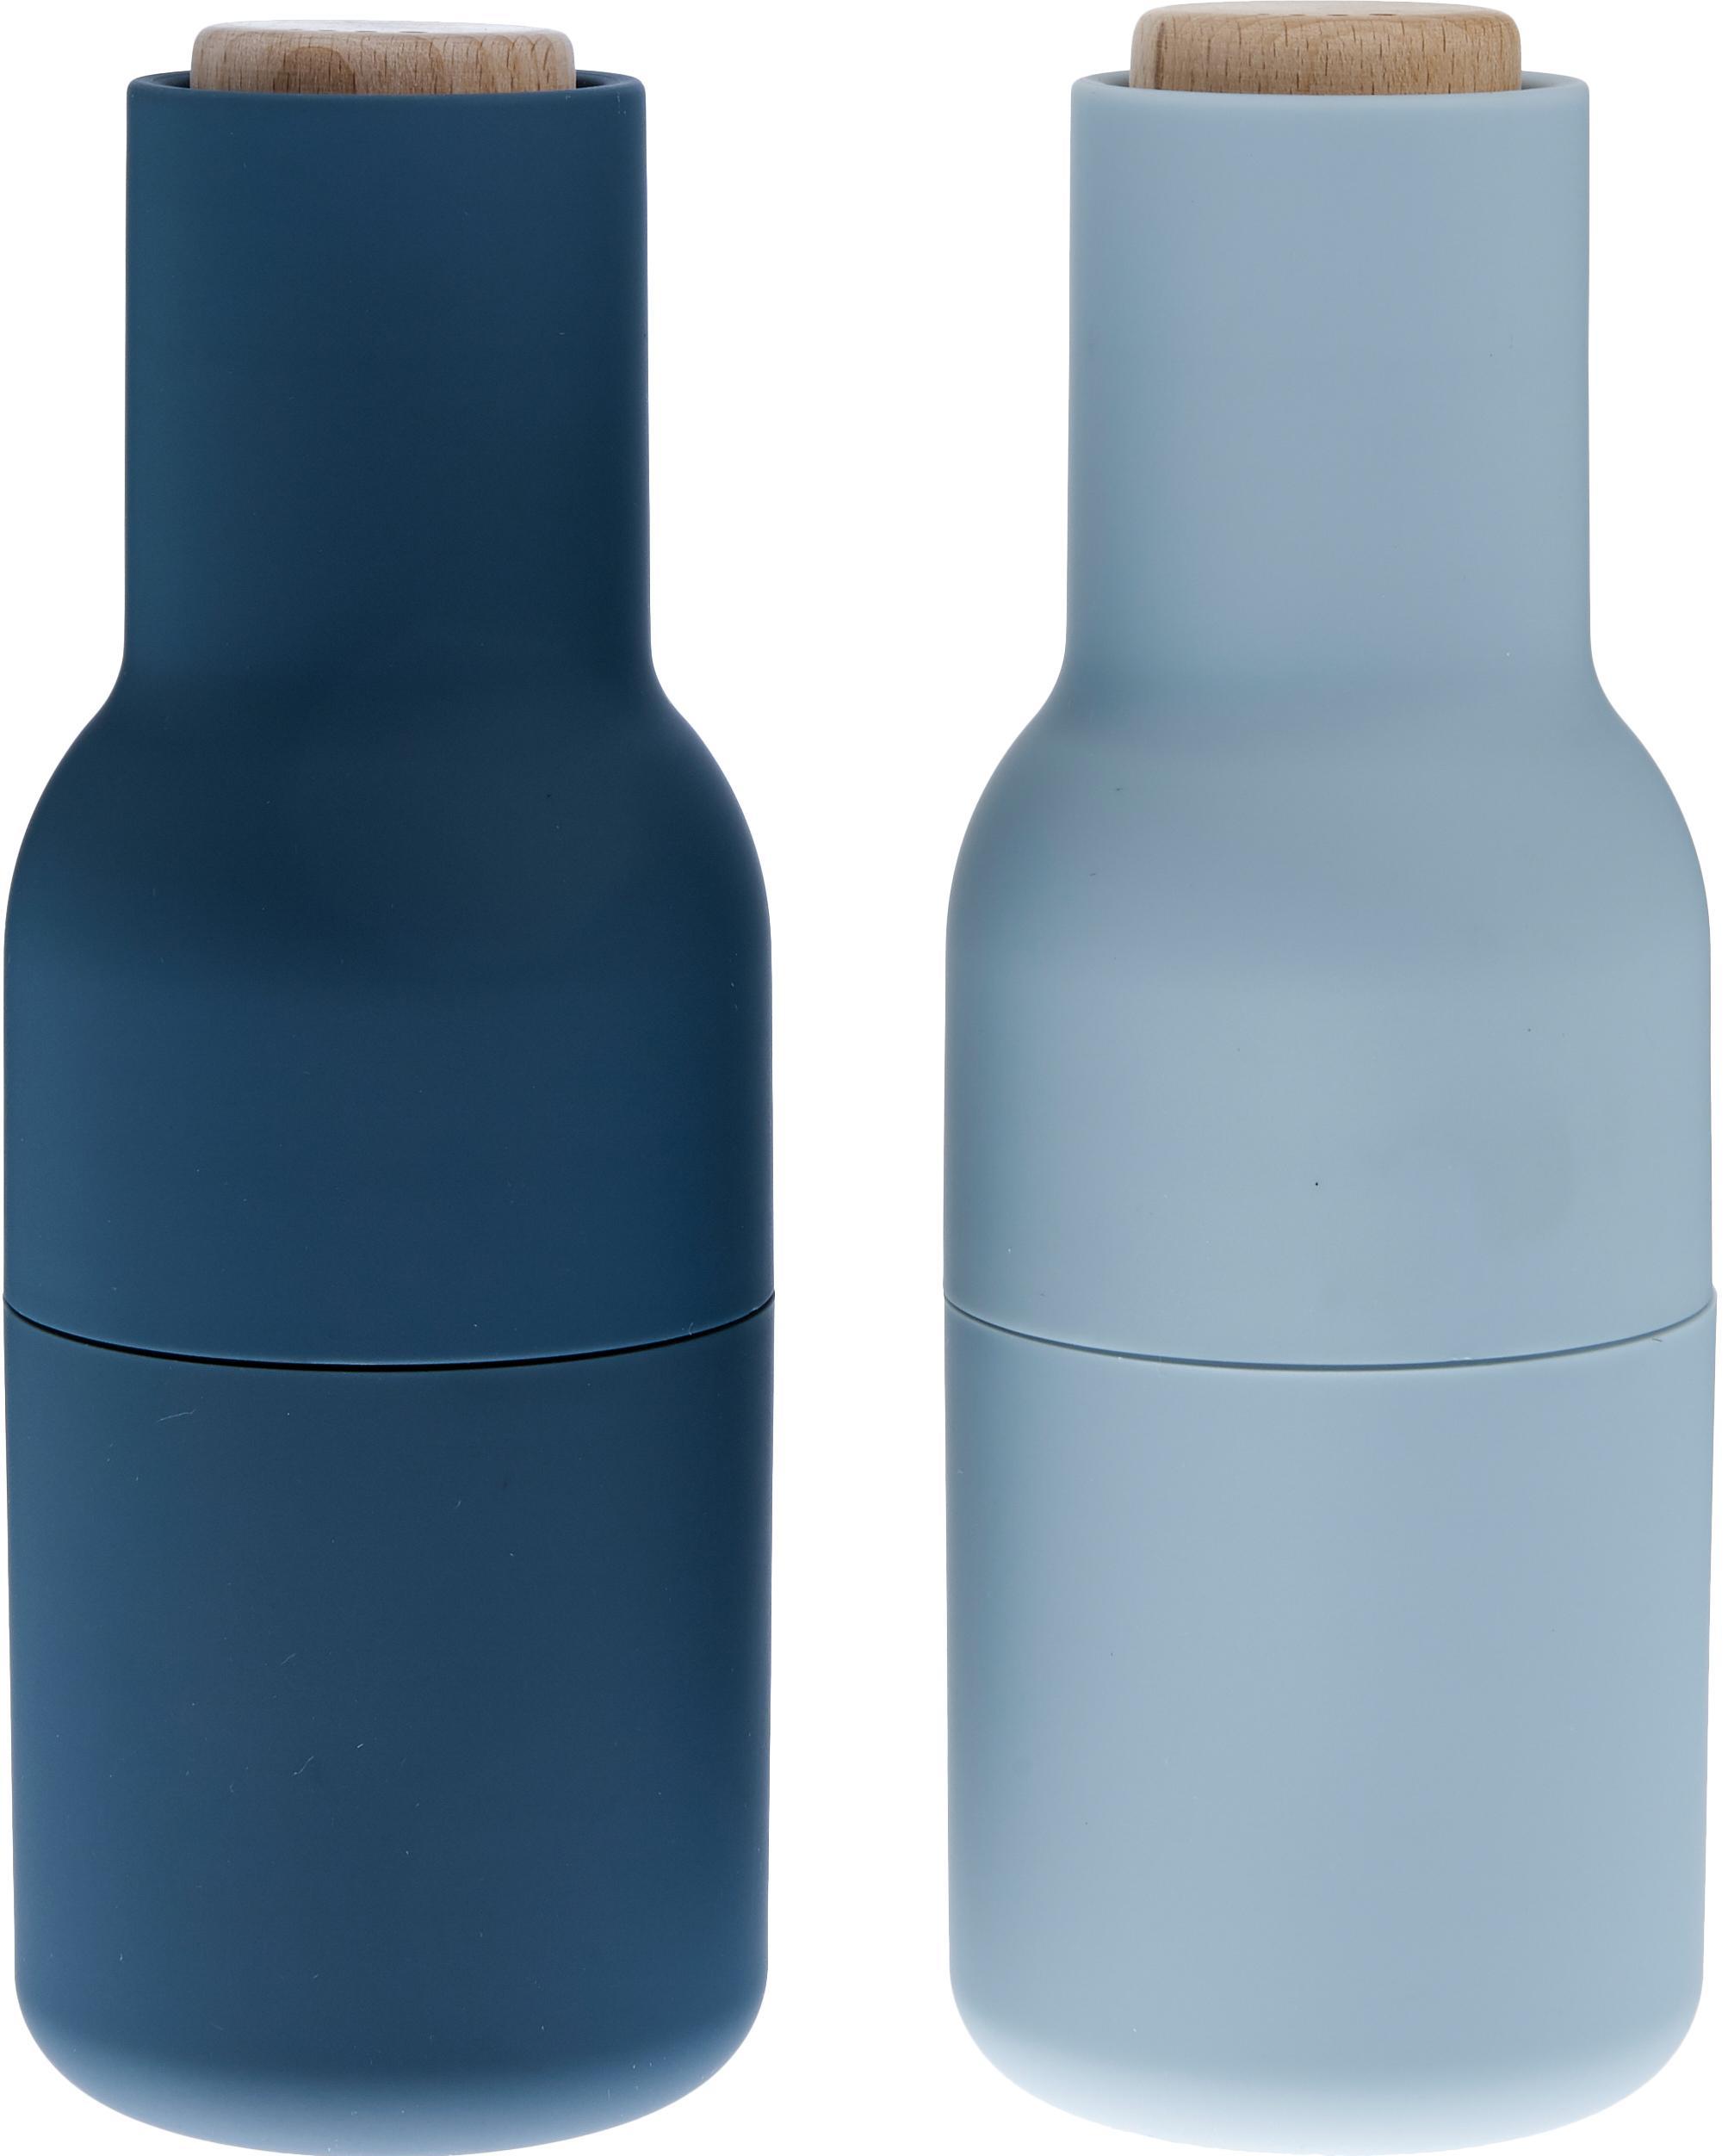 Set macina spezie Bottle Grinder 2 pz, Struttura: materiale sintetico, Coperchio: legno, Blu, azzurro, marrone, Ø 8 x Alt. 21 cm